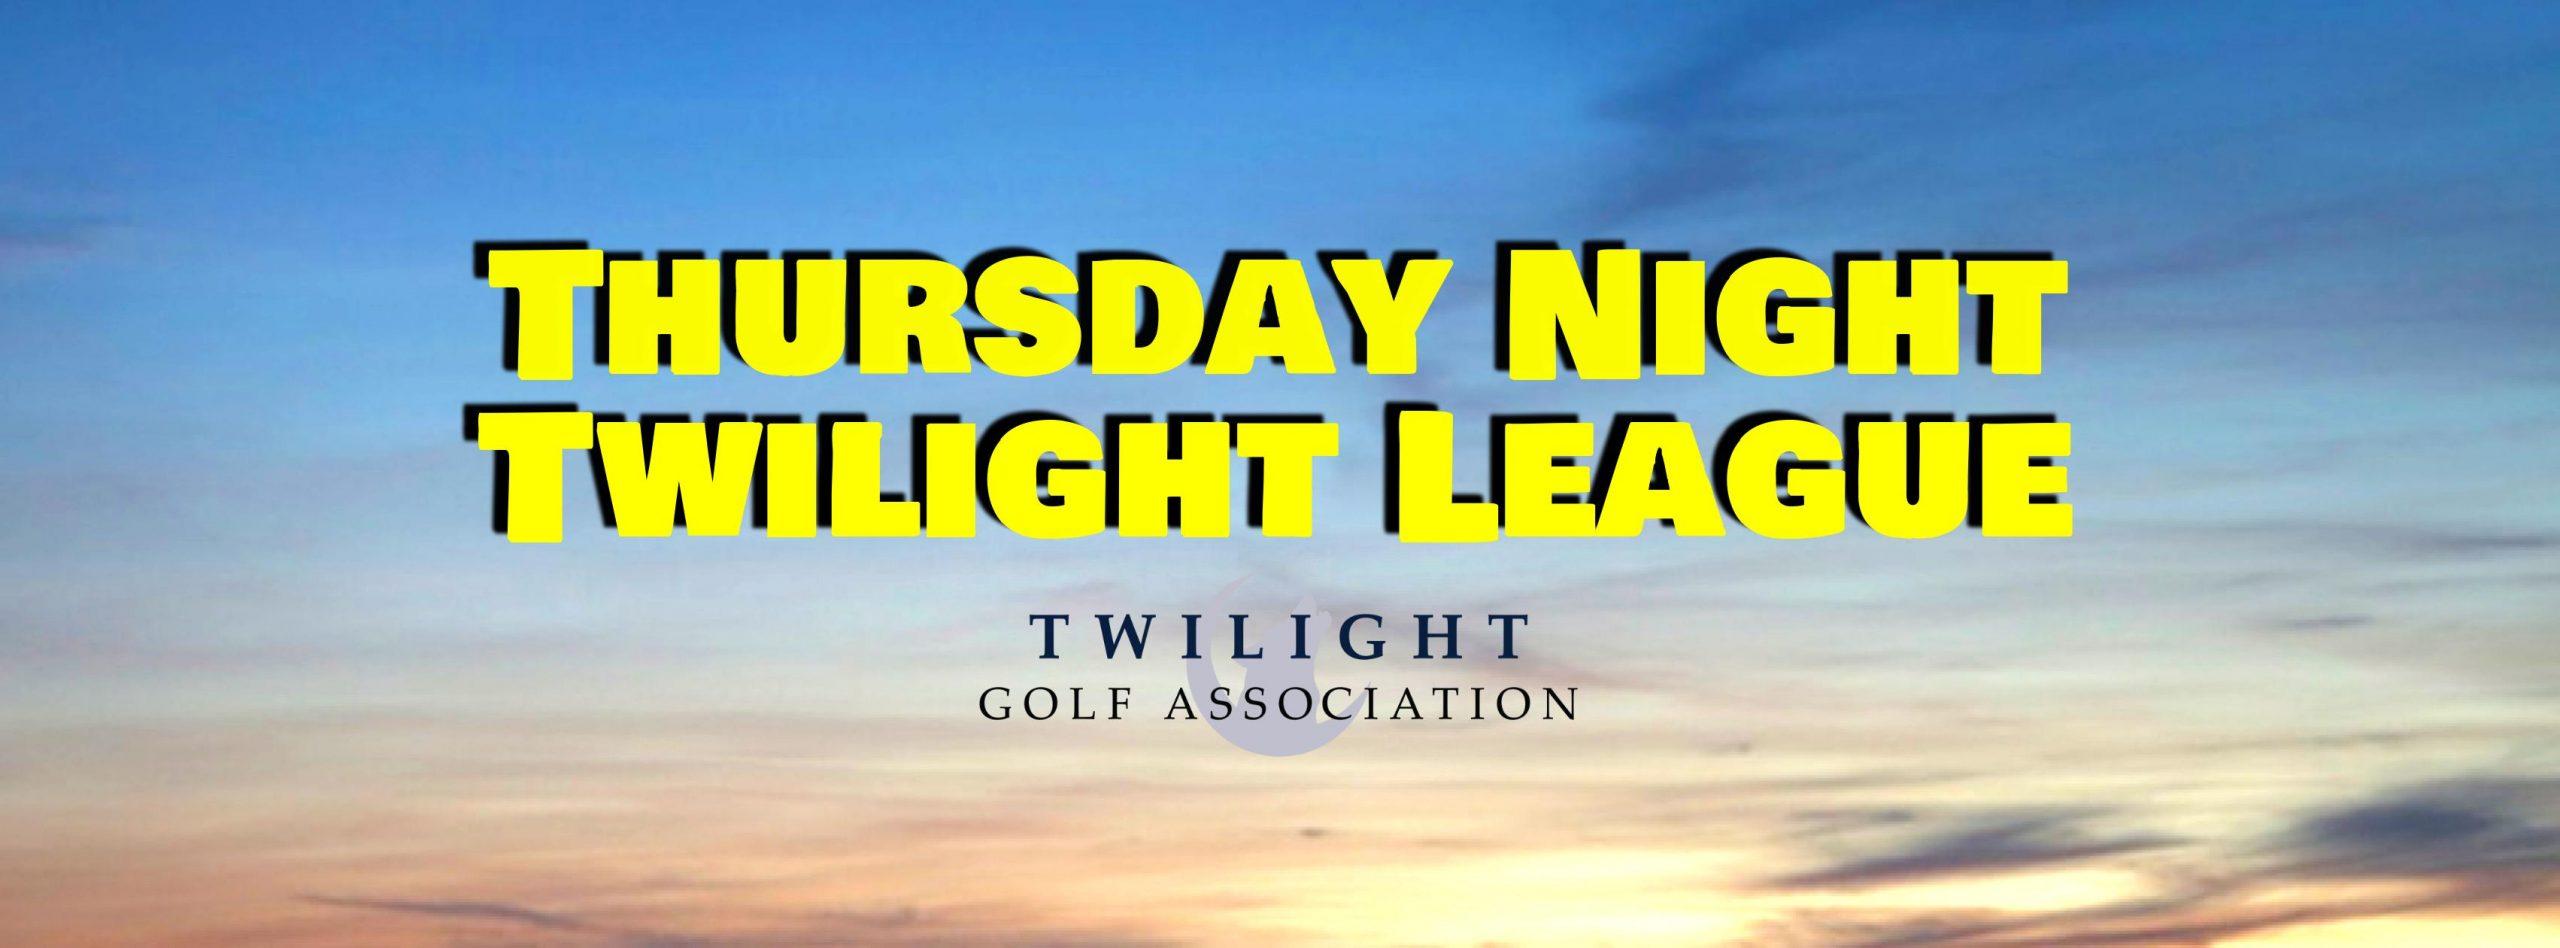 Thursday Twilight League at Riverwinds Golf Course